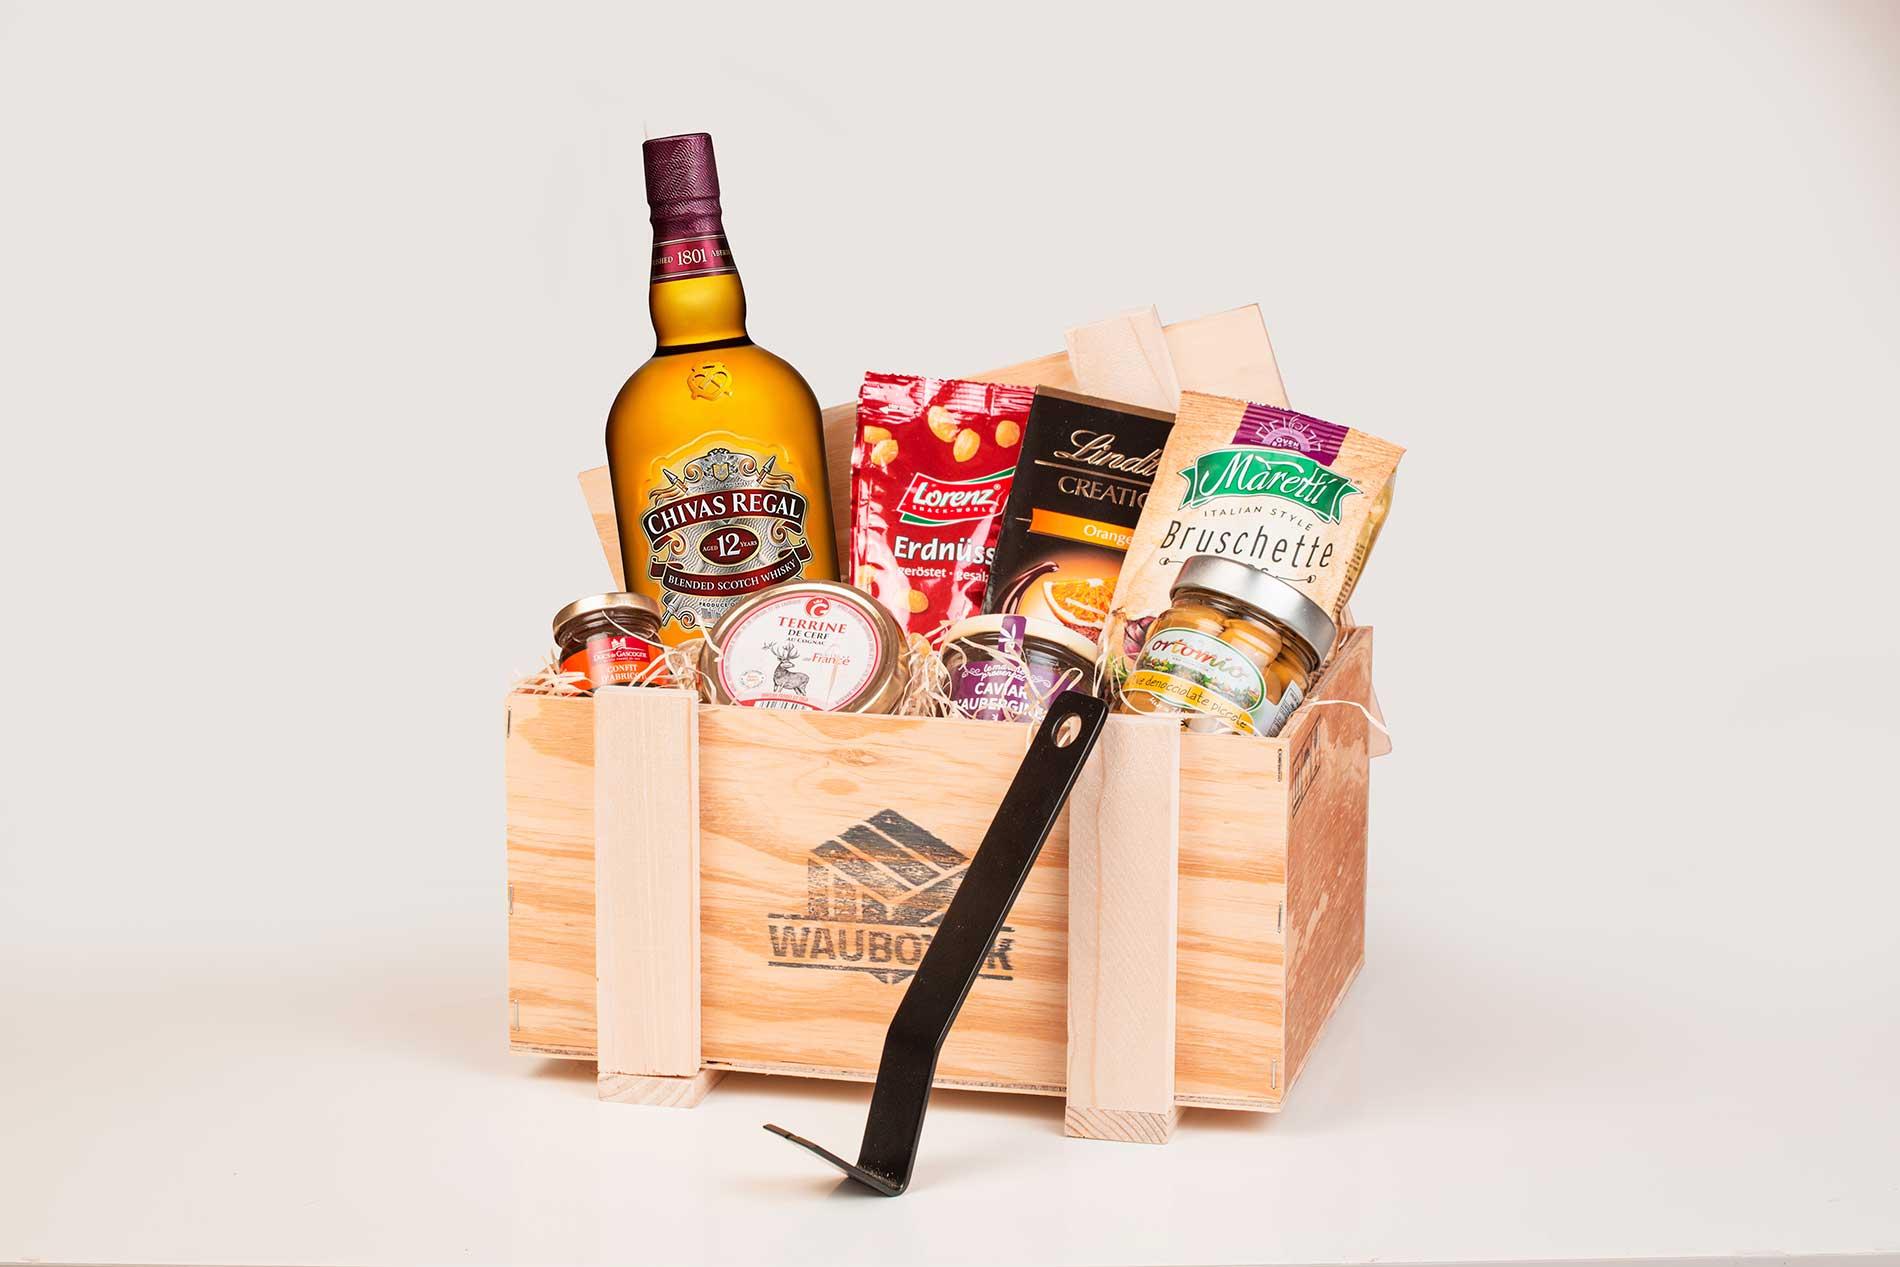 darcekova-debna-whisky-chivas